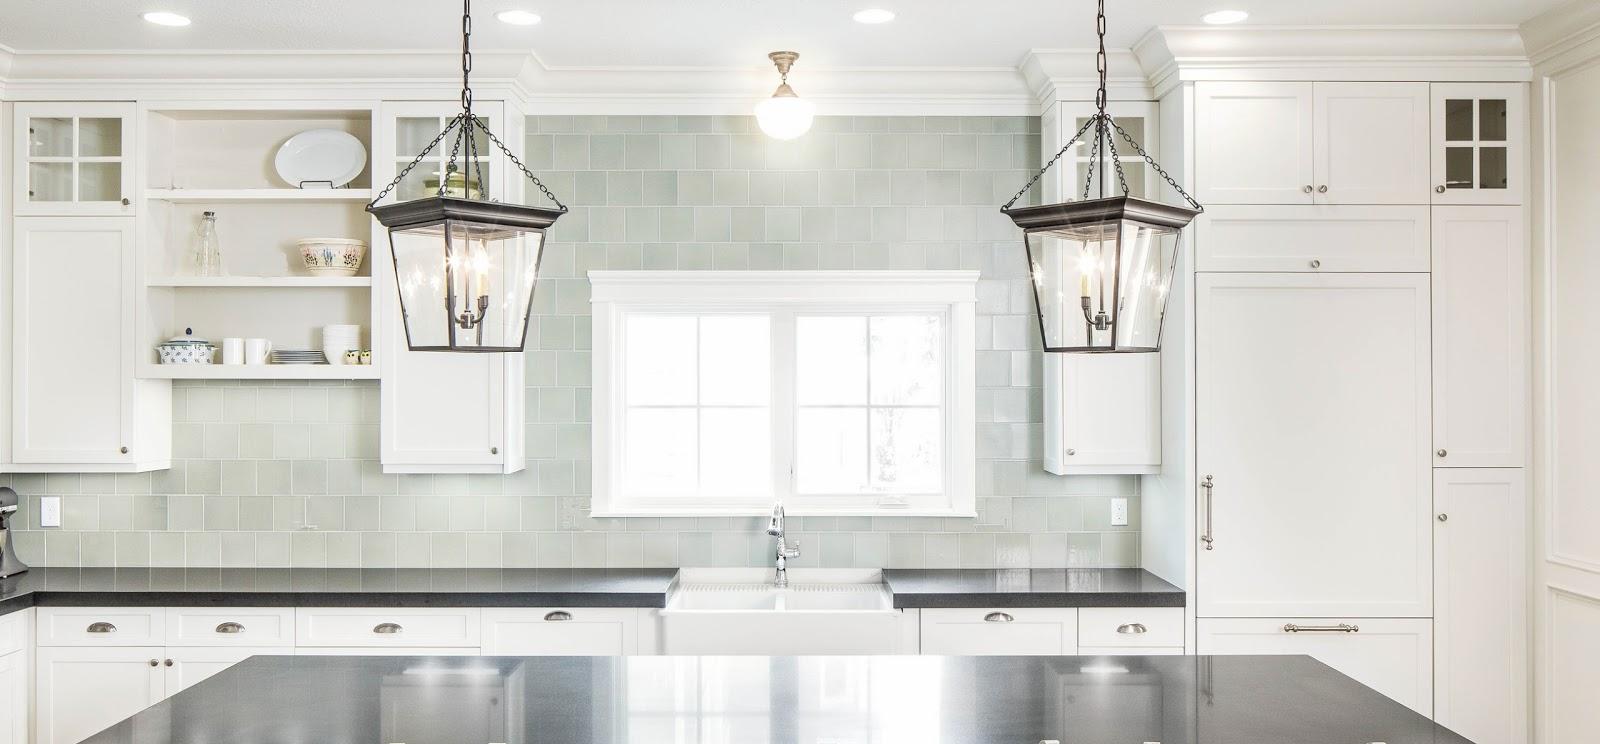 kitchen w handmade tile backsplash visual comfort lanterns honed